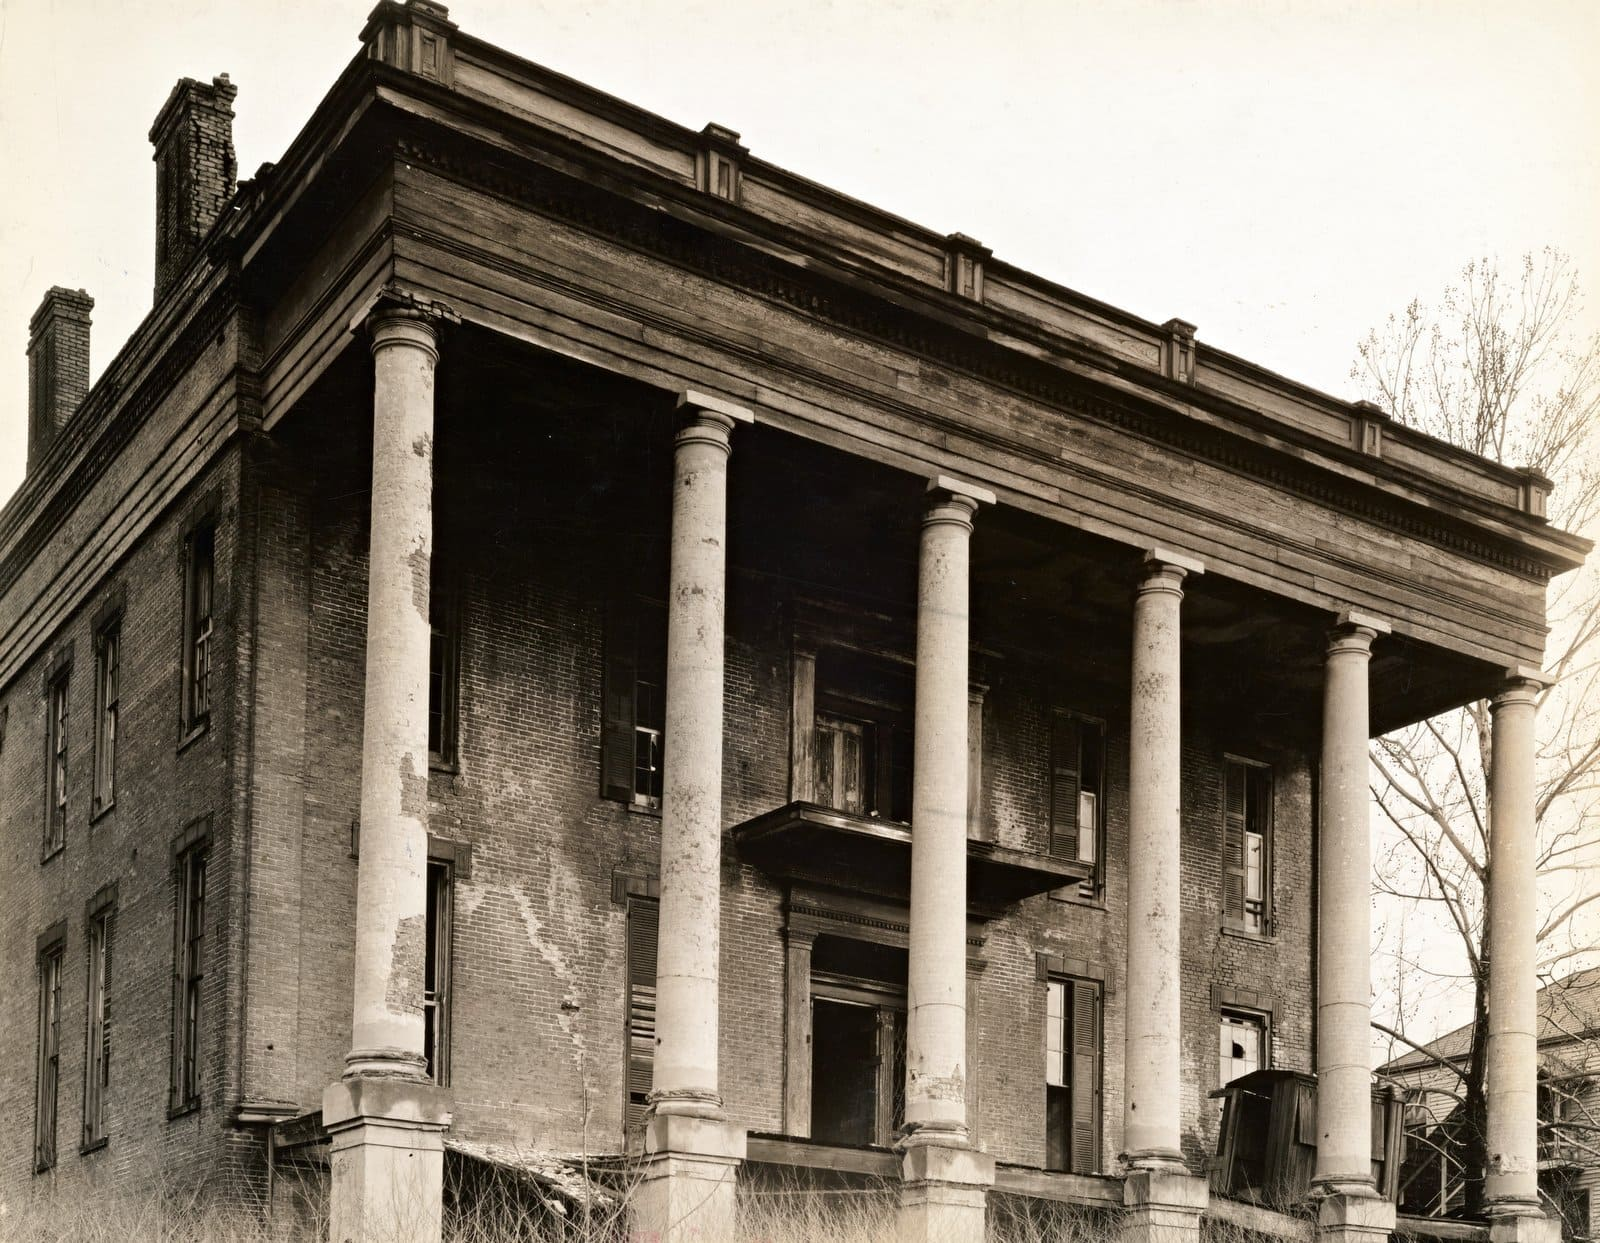 Antebellum plantation - Vicksburg, Mississippi (1936)